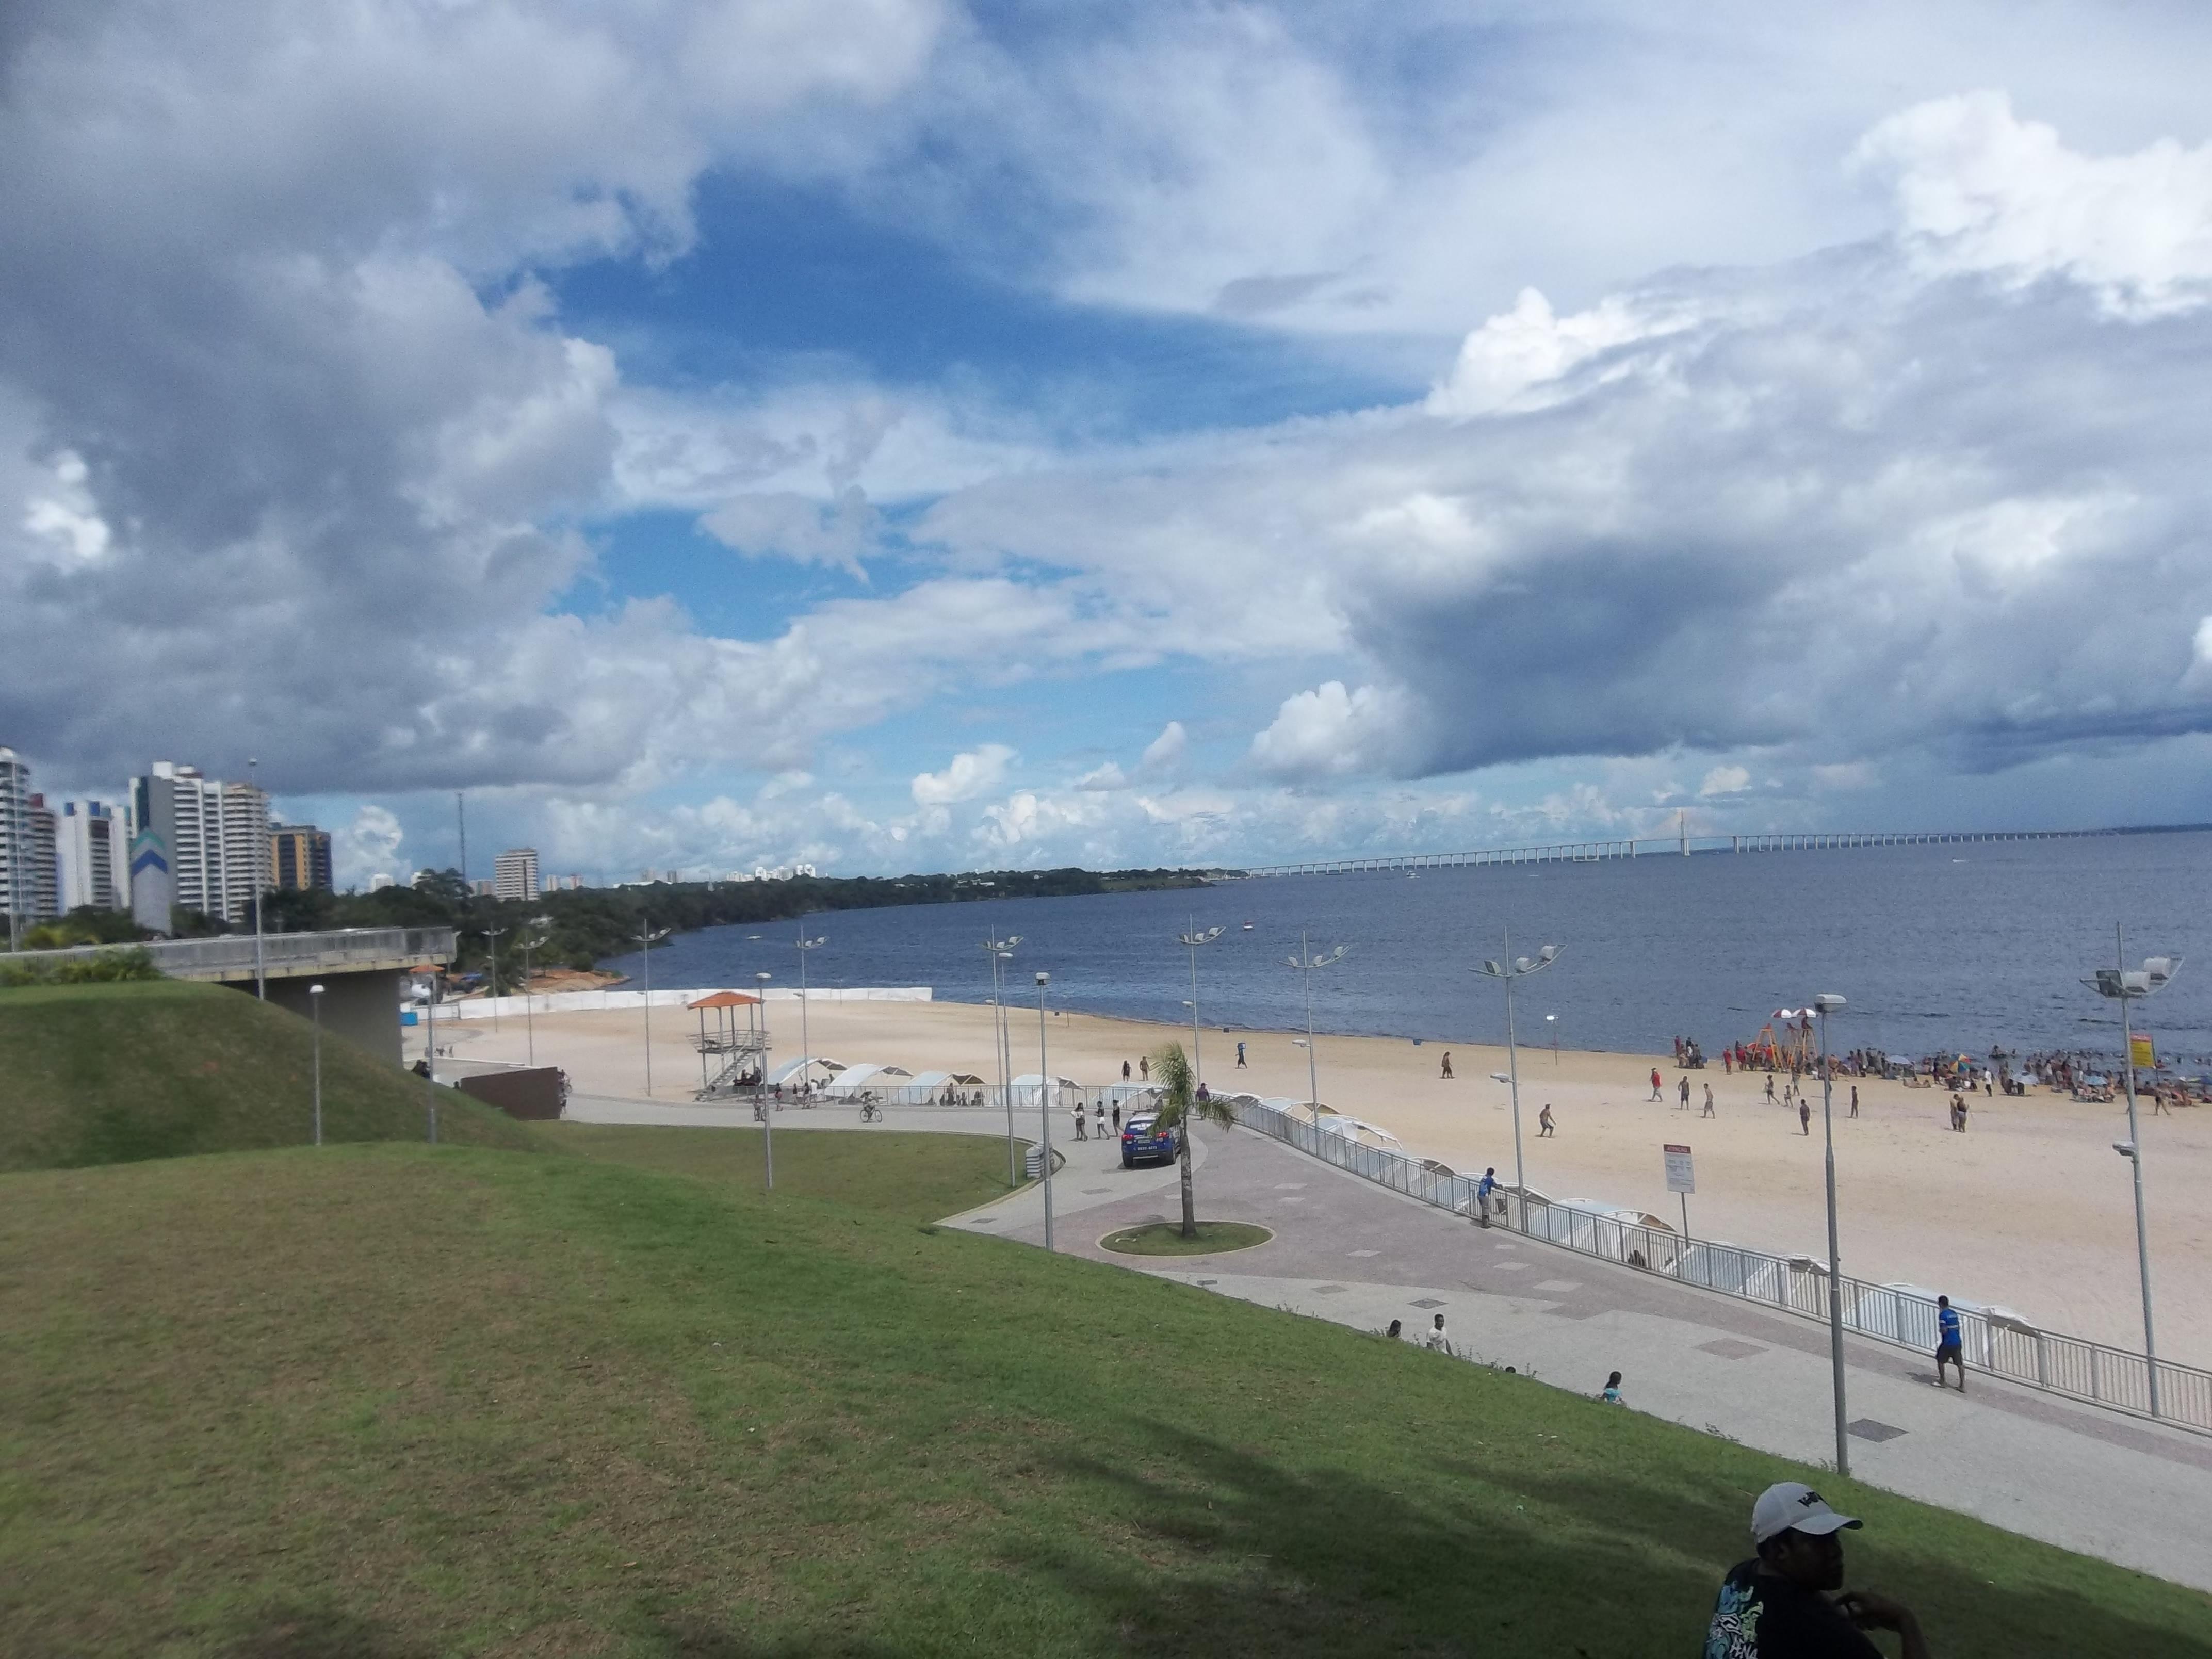 File:Praia da Ponta Negra Manaus.JPG - Wikimedia Commons